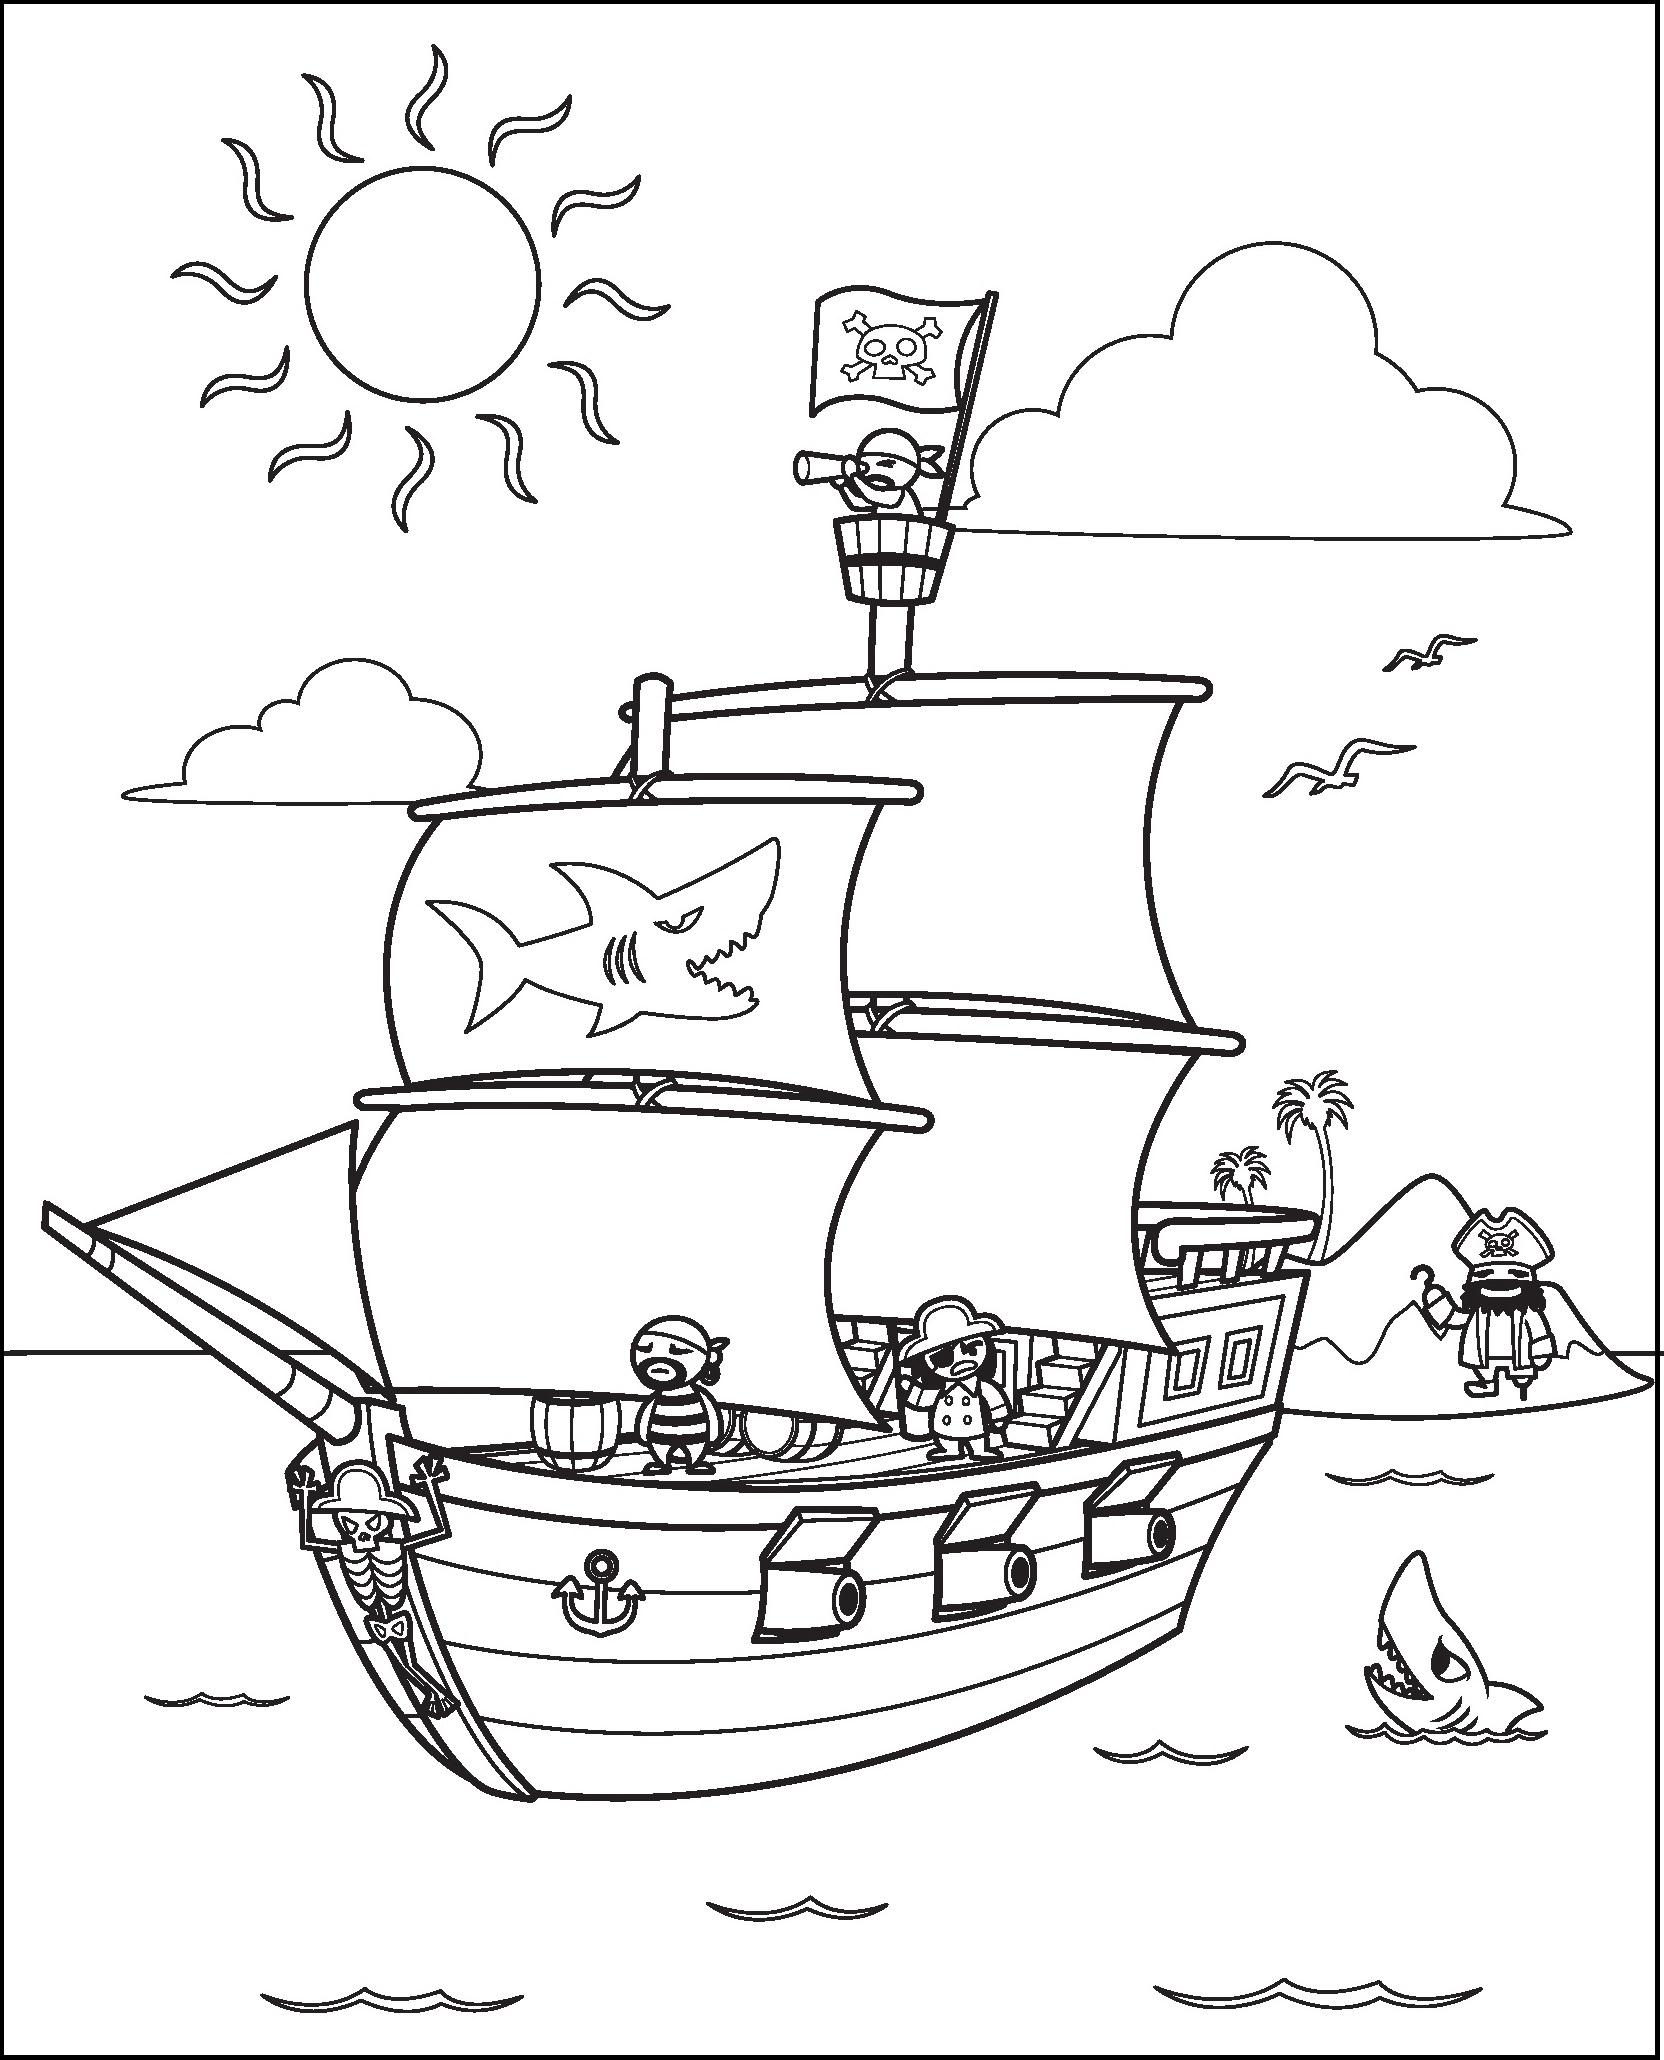 Раскраска корабли пиратов на vipraskraski.ru